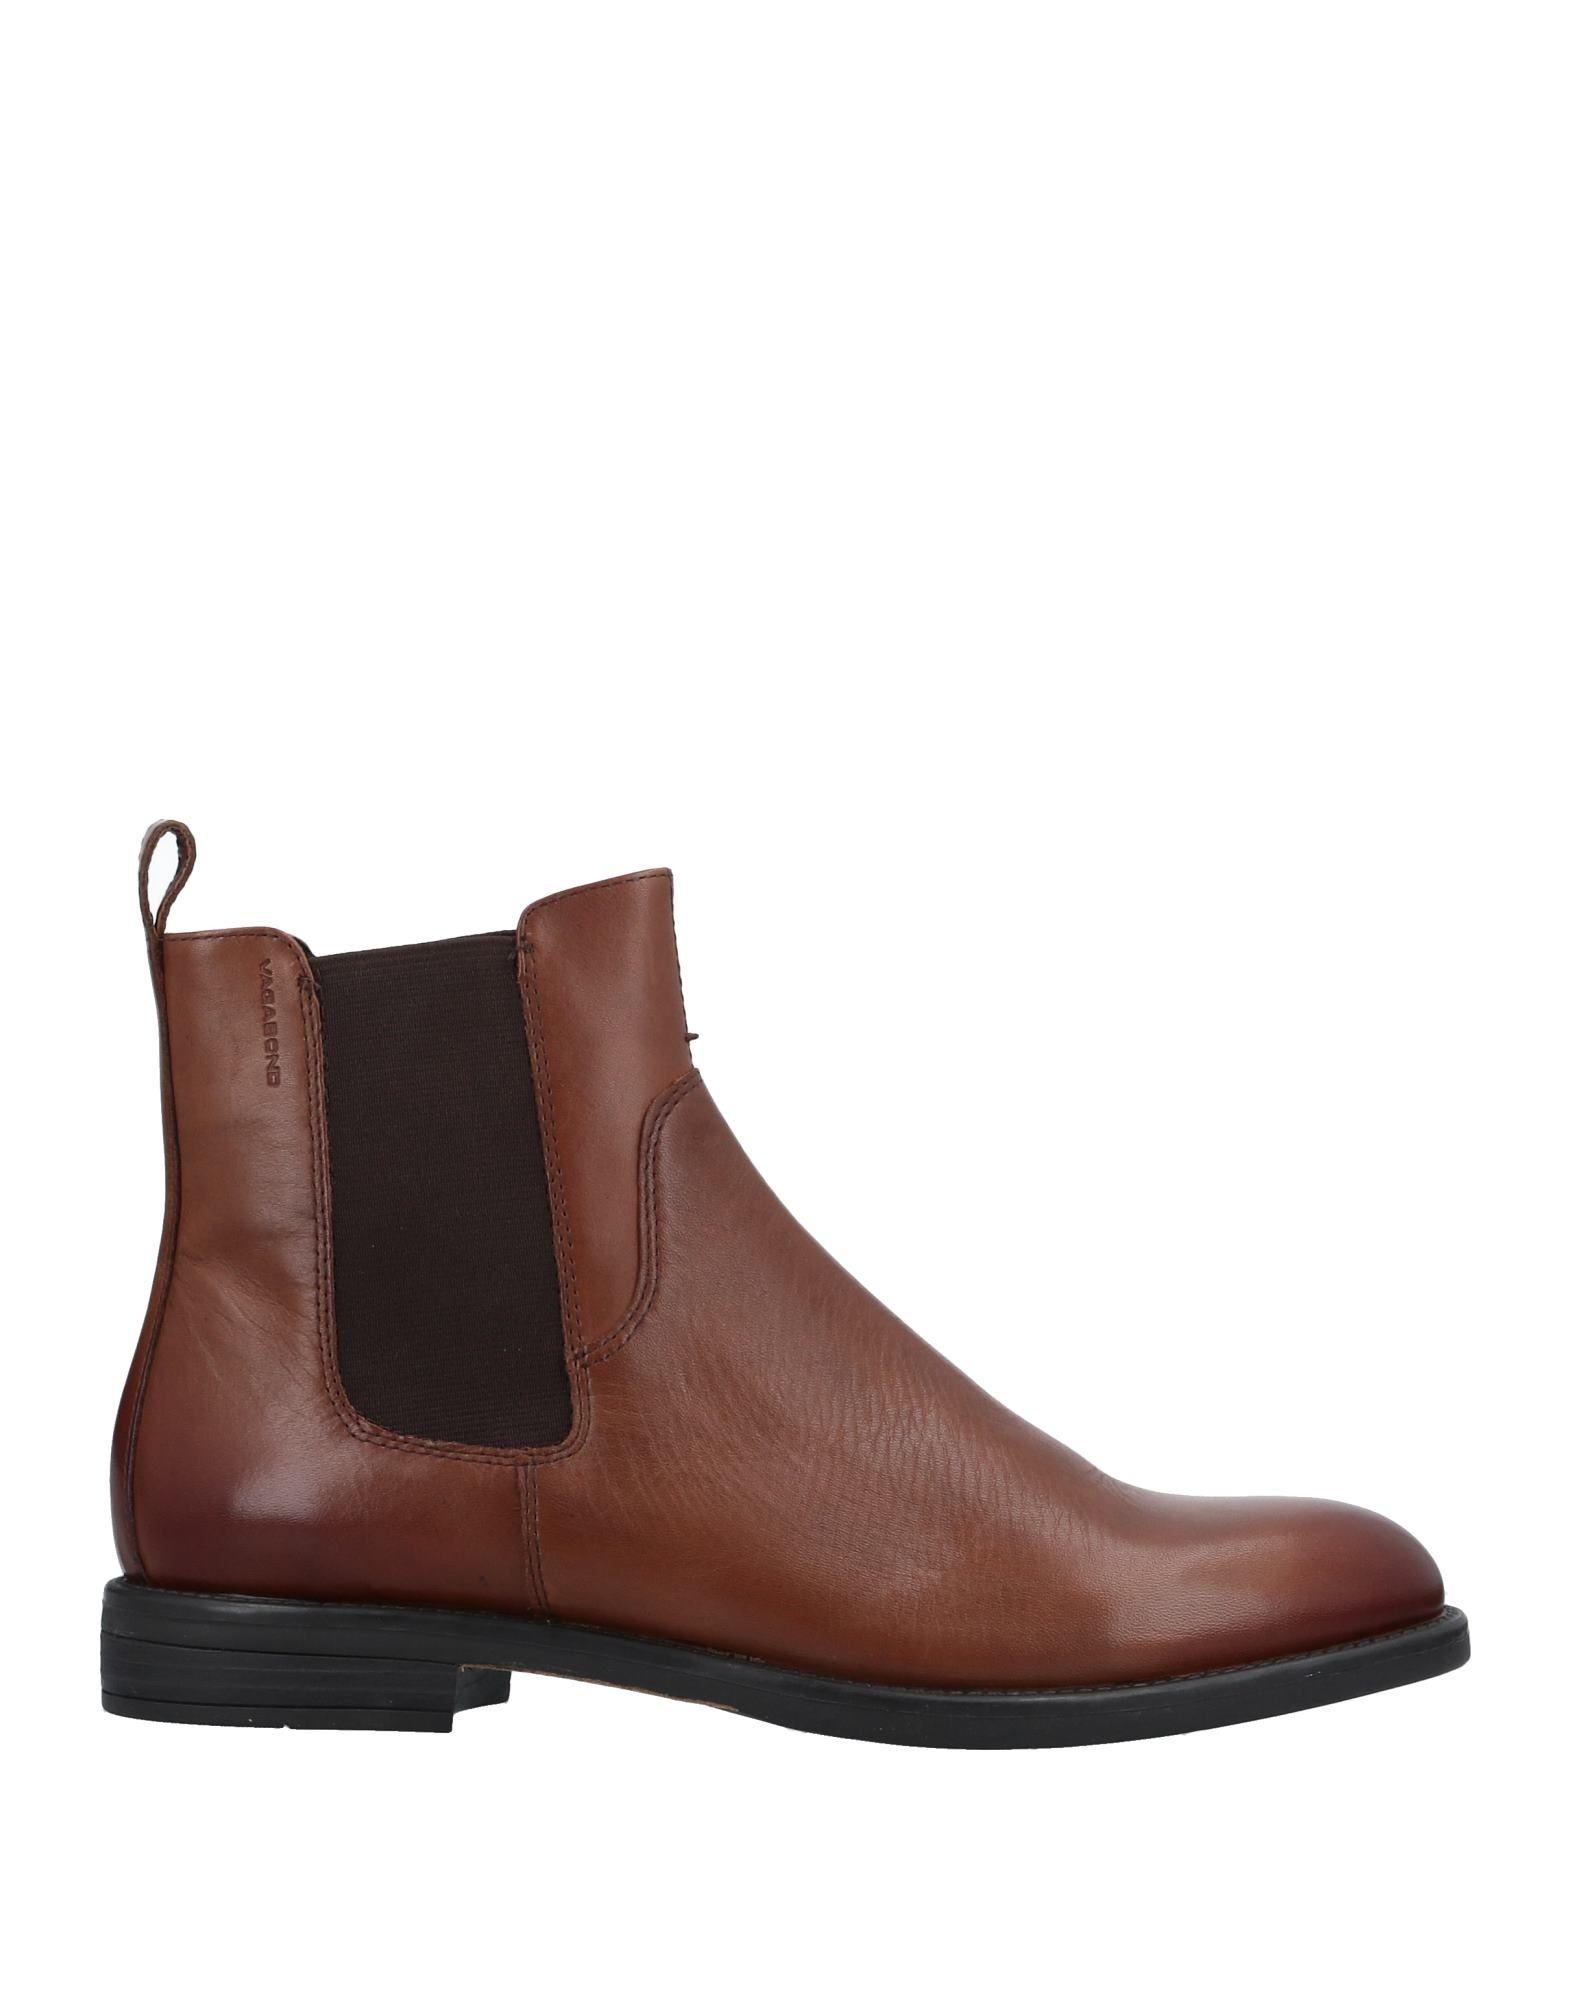 Vagabond Shoemakers Chelsea Boots Damen  11512969GU Gute Qualität beliebte Schuhe